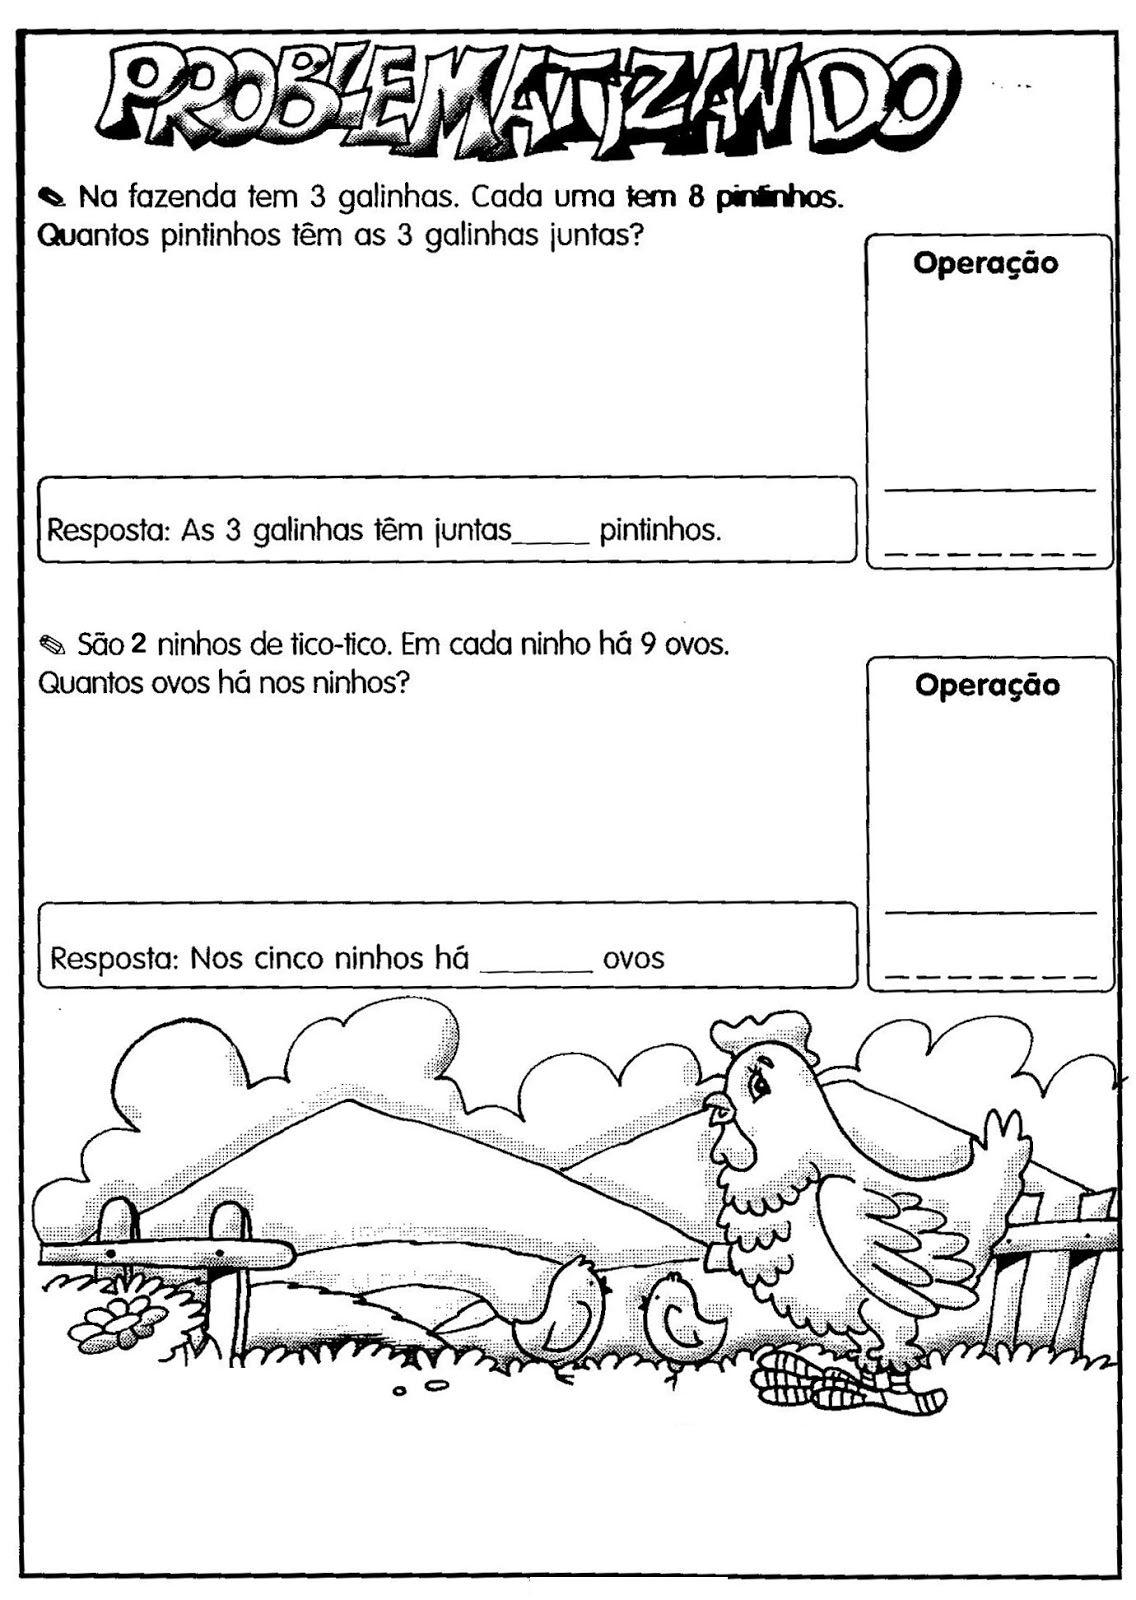 atividades-educativas-matematica-multiplicacao-10.jpg ...